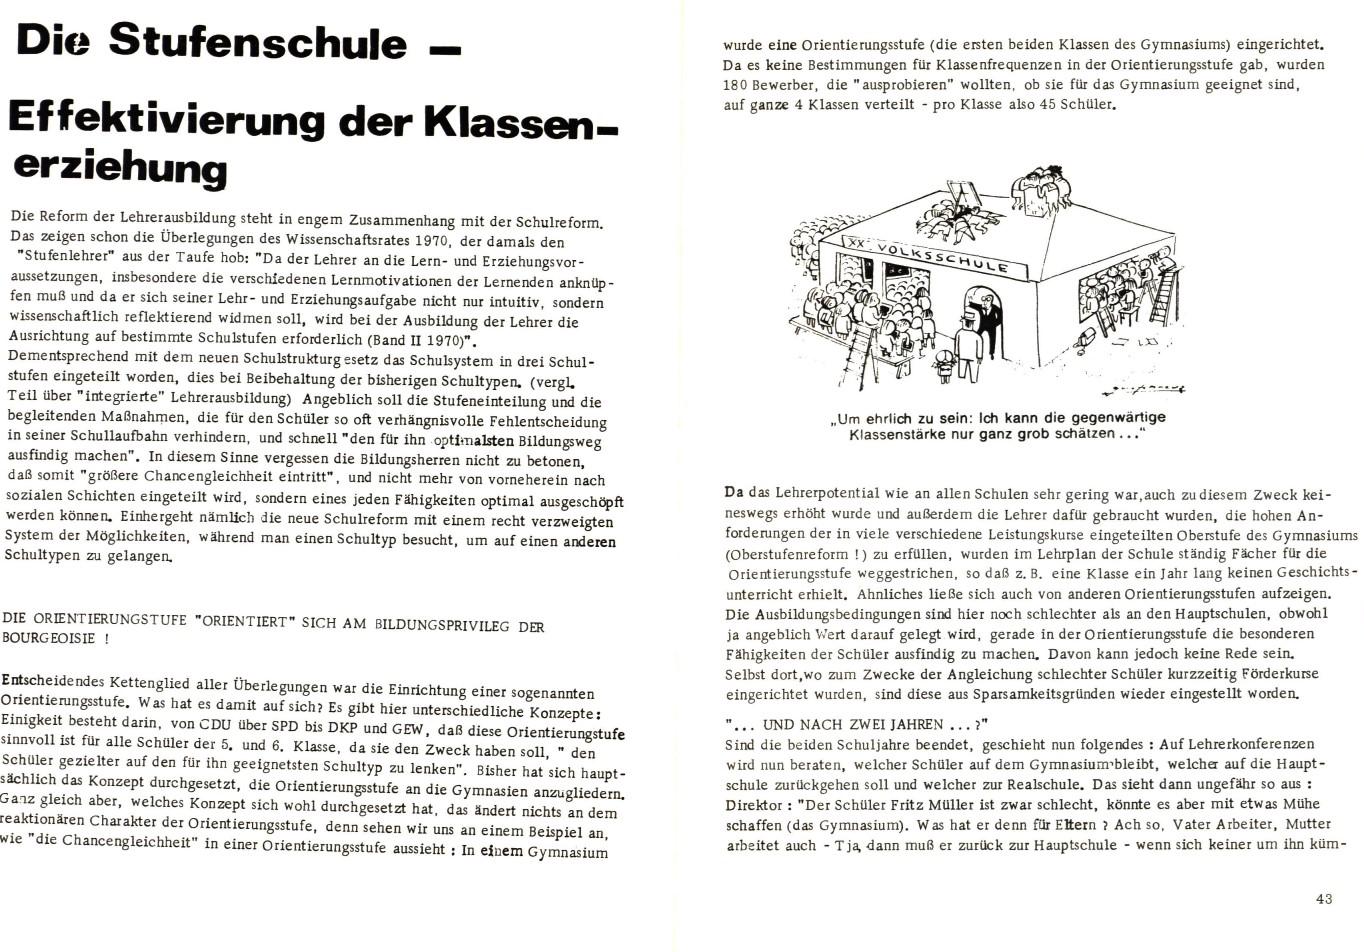 KSV_1975_Lehrerausbildung_22